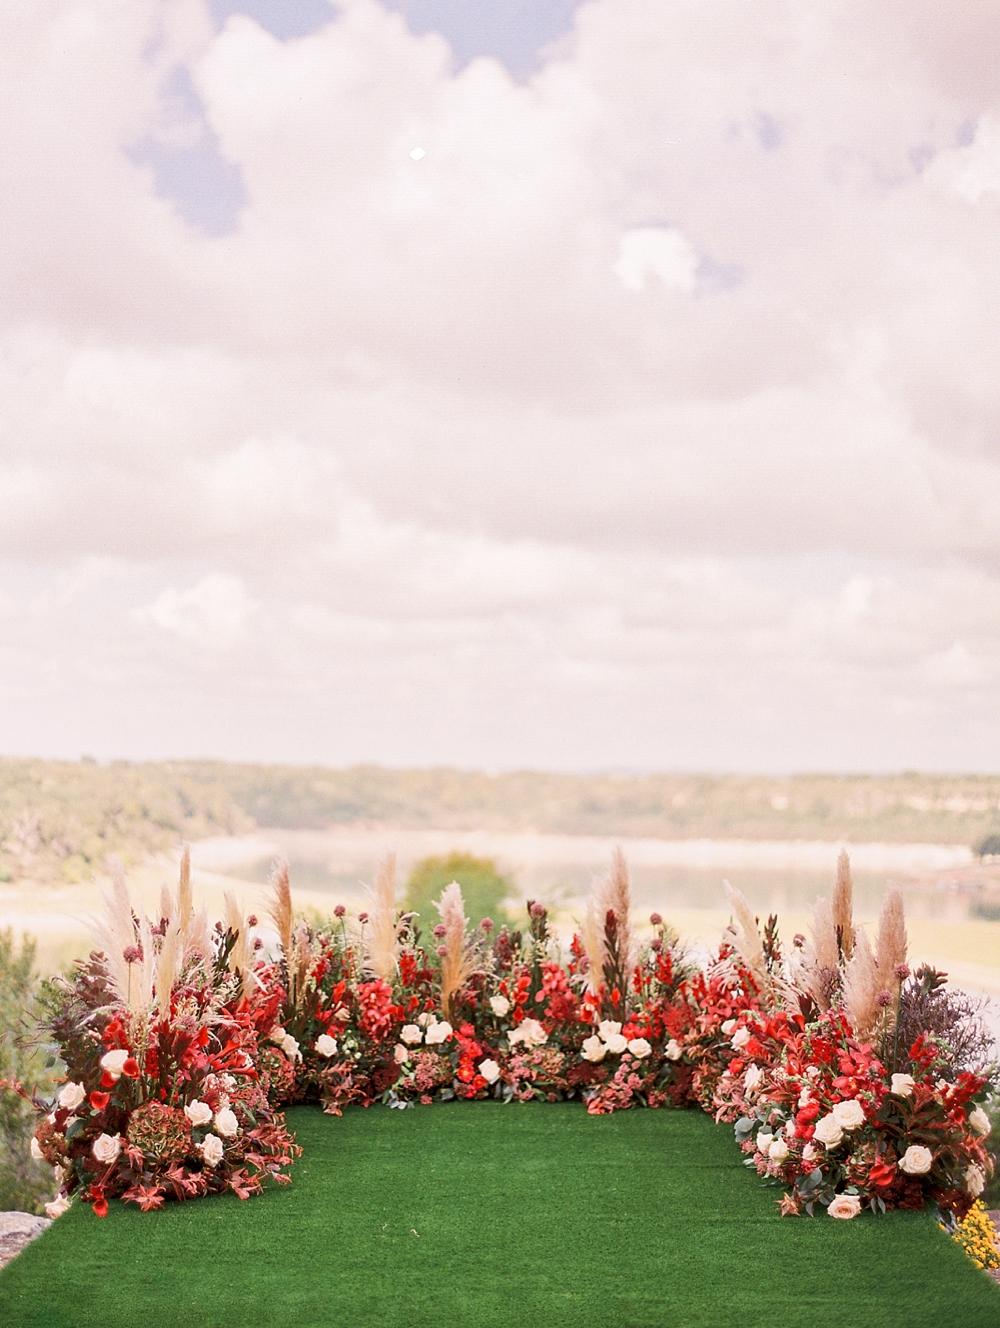 kristin-la-voie-photography-AUSTIN-WEDDING-PHOTOGRAPHER-BEST-IN-TEXAS-26